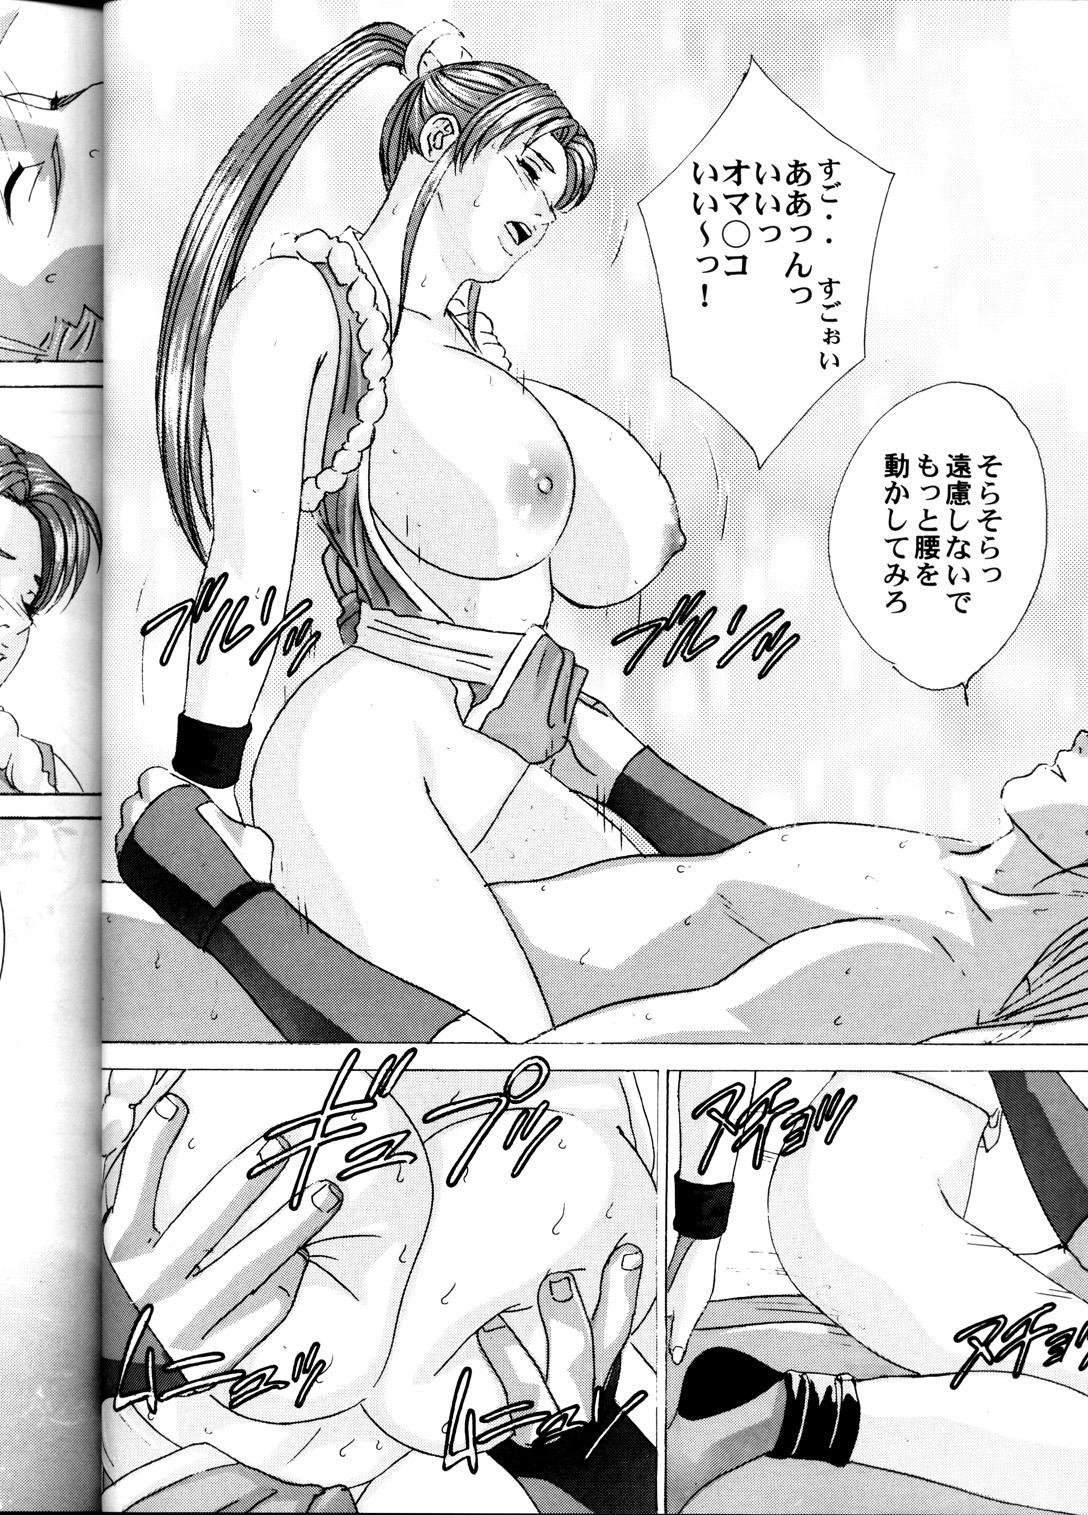 (C60) [D-LOVERS (Nishimaki Tohru)] Mai -Innyuuden- Daiichigou (King of Fighters) 28